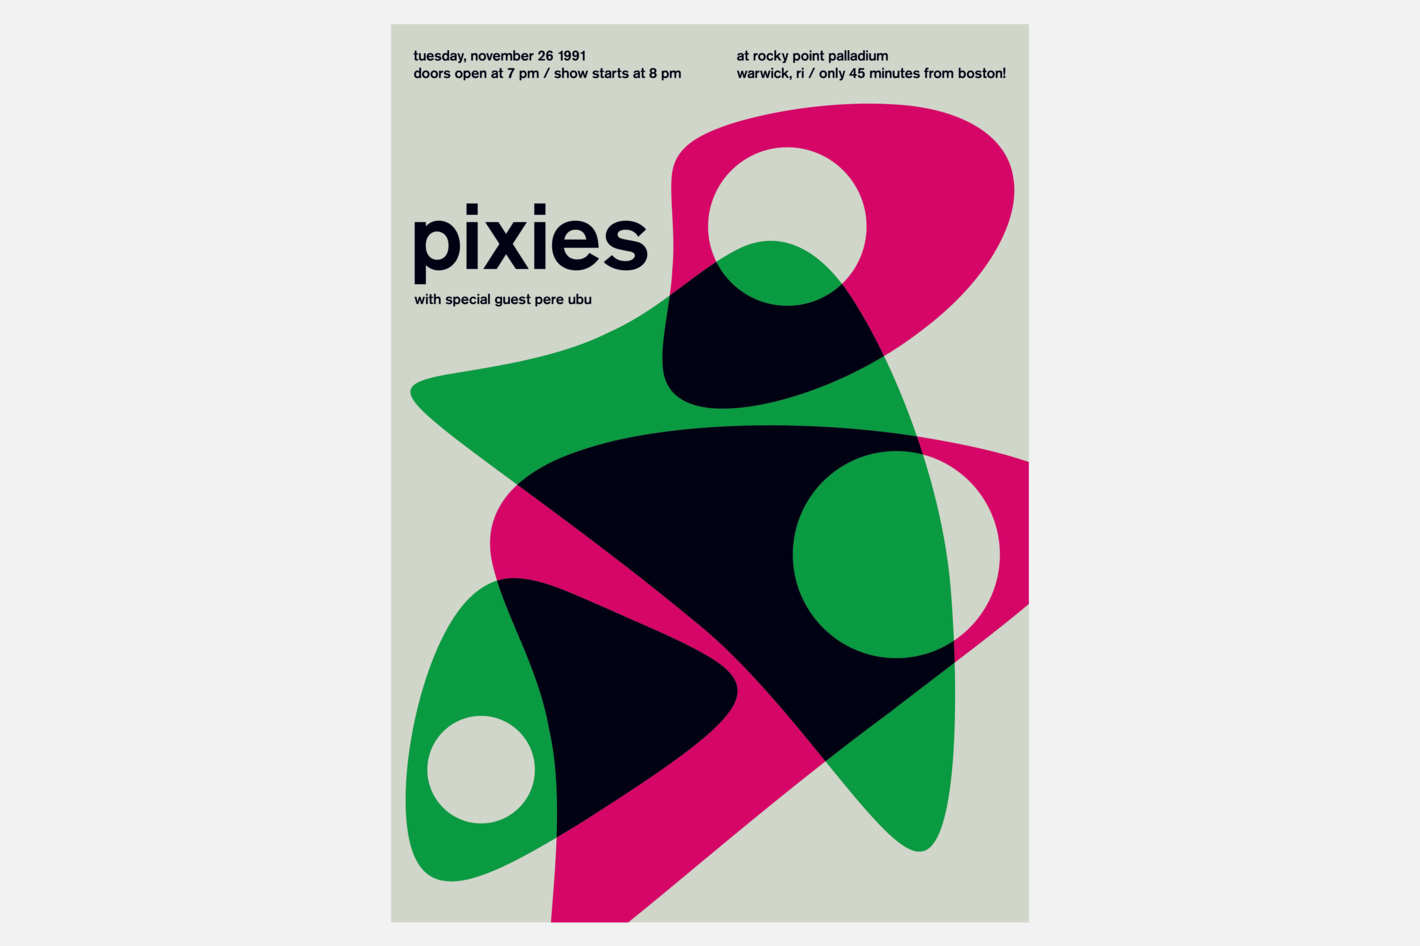 "Swissted ""Pixies at Rockpoint Palladium, 1991"" Print"